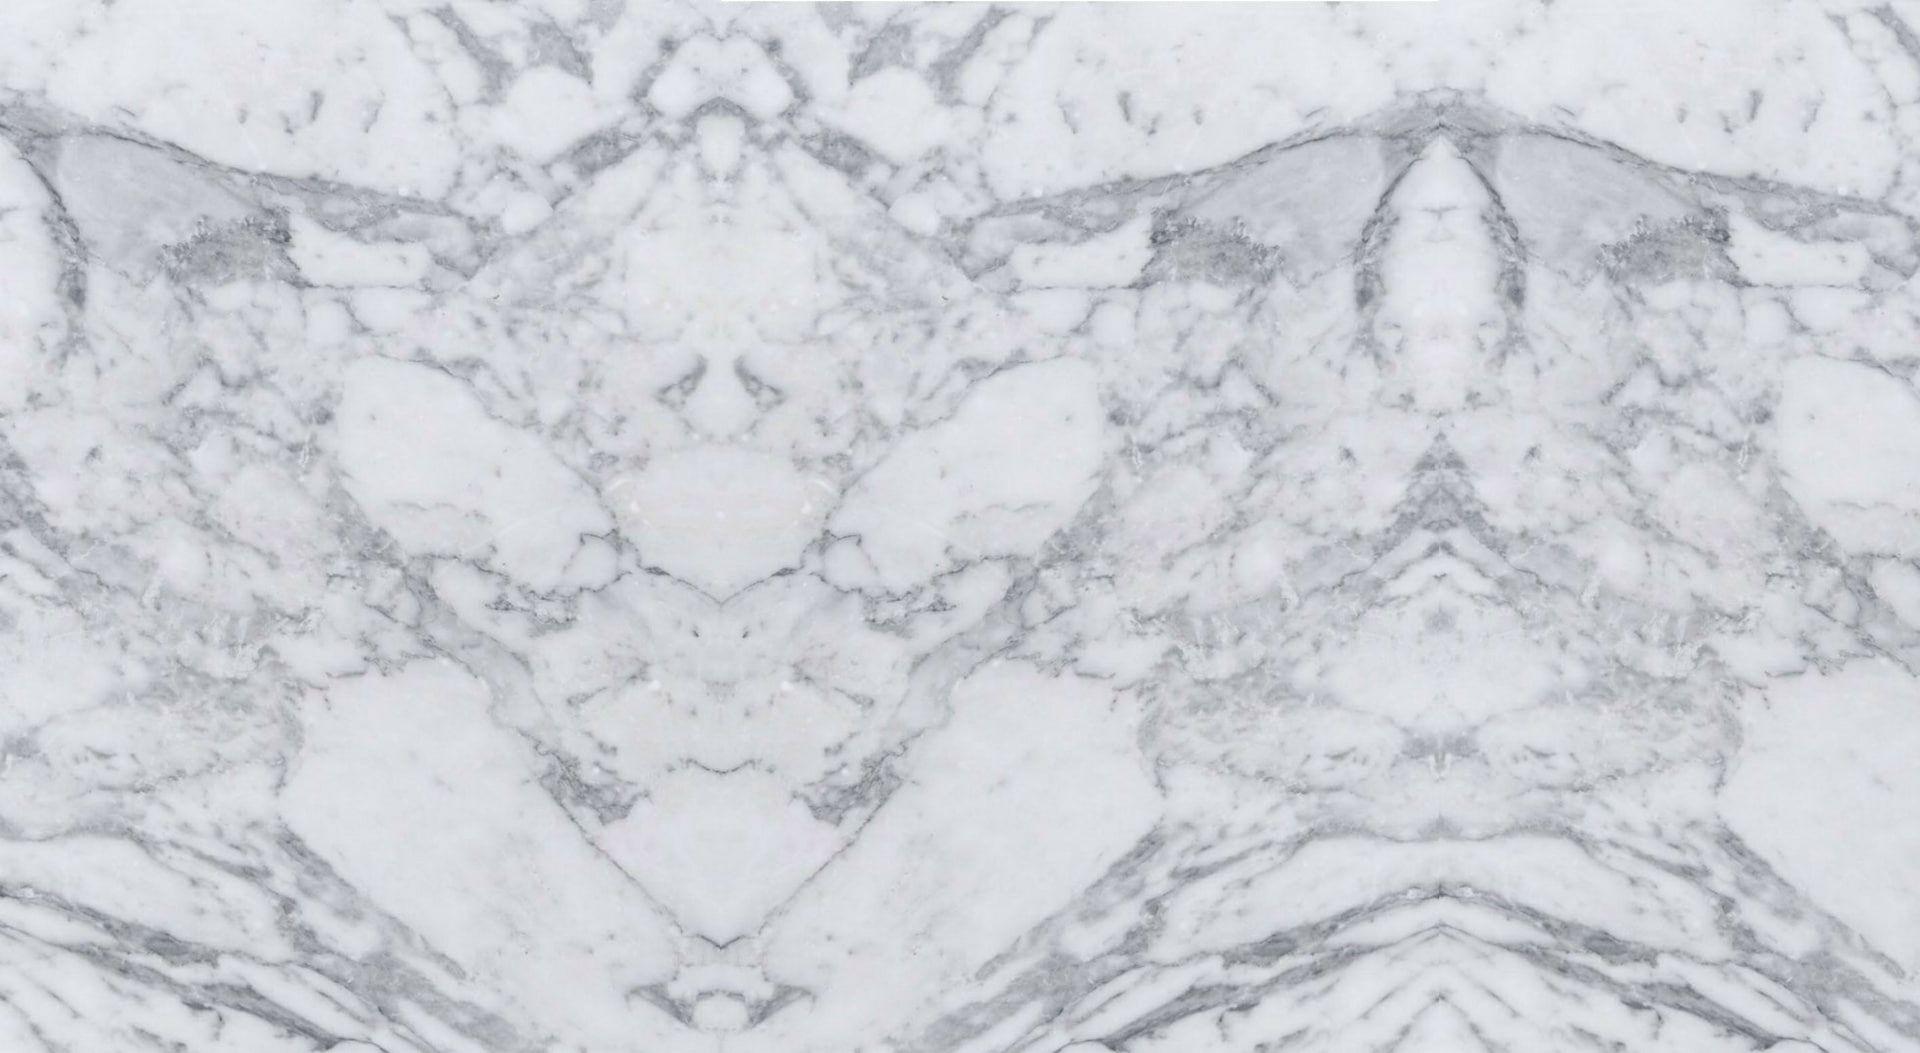 Marmol Minimal Aero White Marble White Surface 1080p Wallpaper Hdwallpaper Desktop Hd Wallpaper Background Patterns 1080p Wallpaper